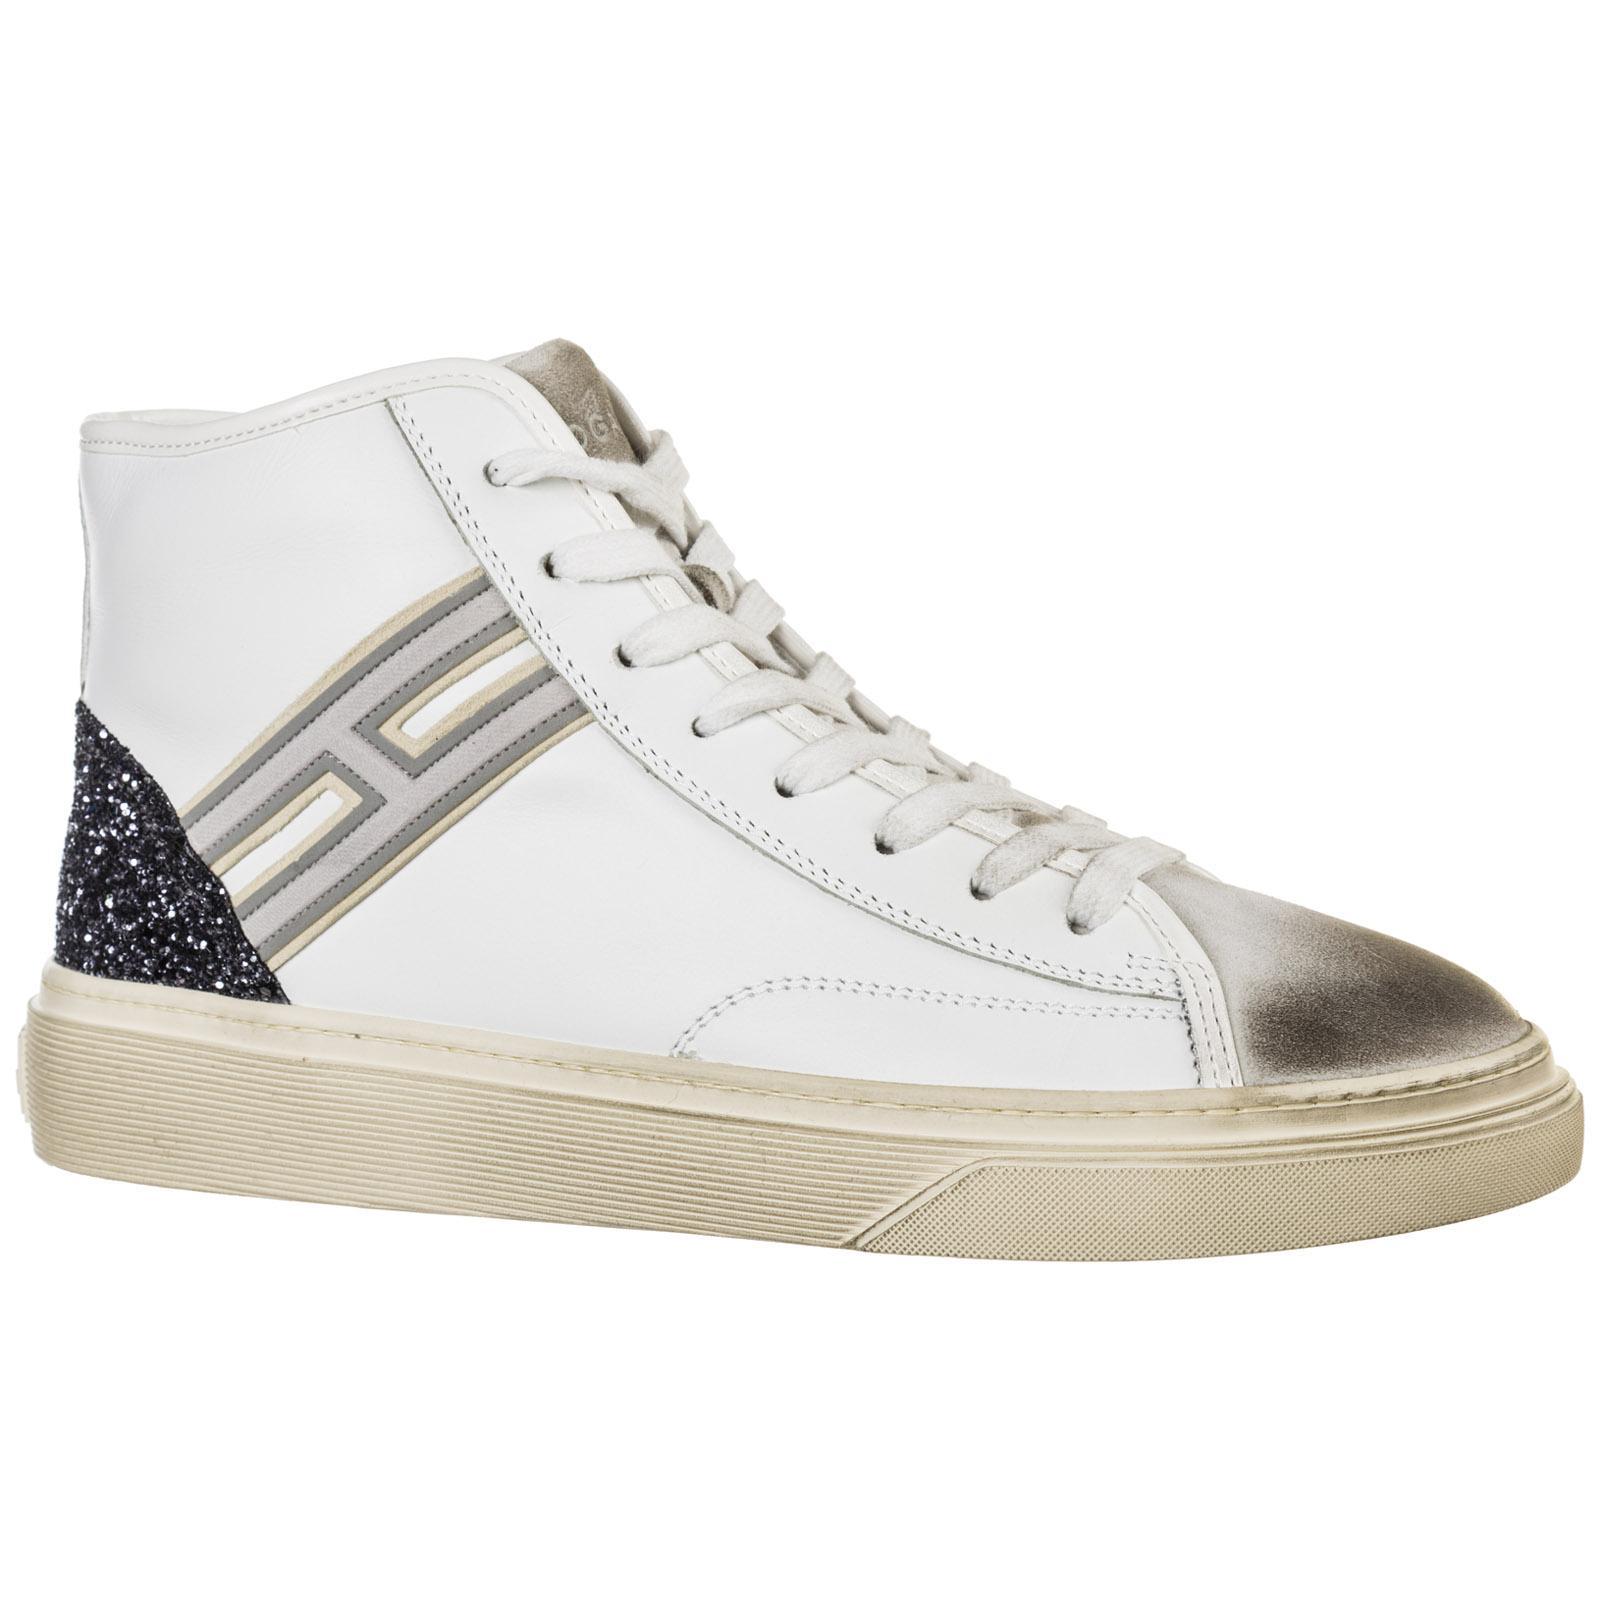 Scarpe sneakers alte donna in pelle h342Hogan in Pelle di colore ...